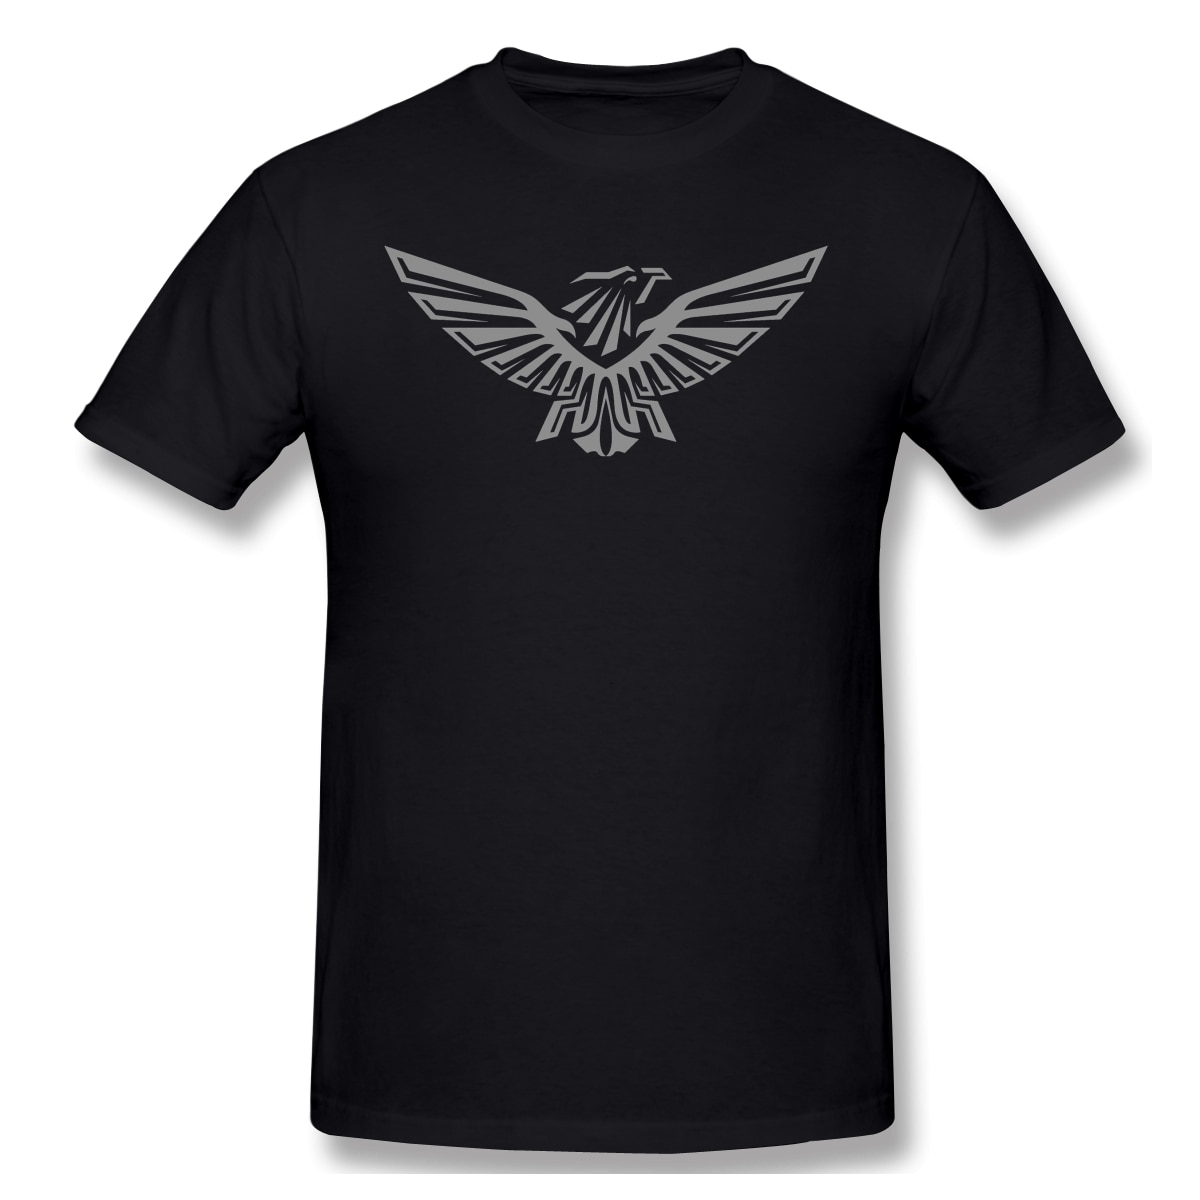 Nueva camiseta de verano, camiseta Desmond Miles Eagle, Camiseta de algodón assassins creed ofertas